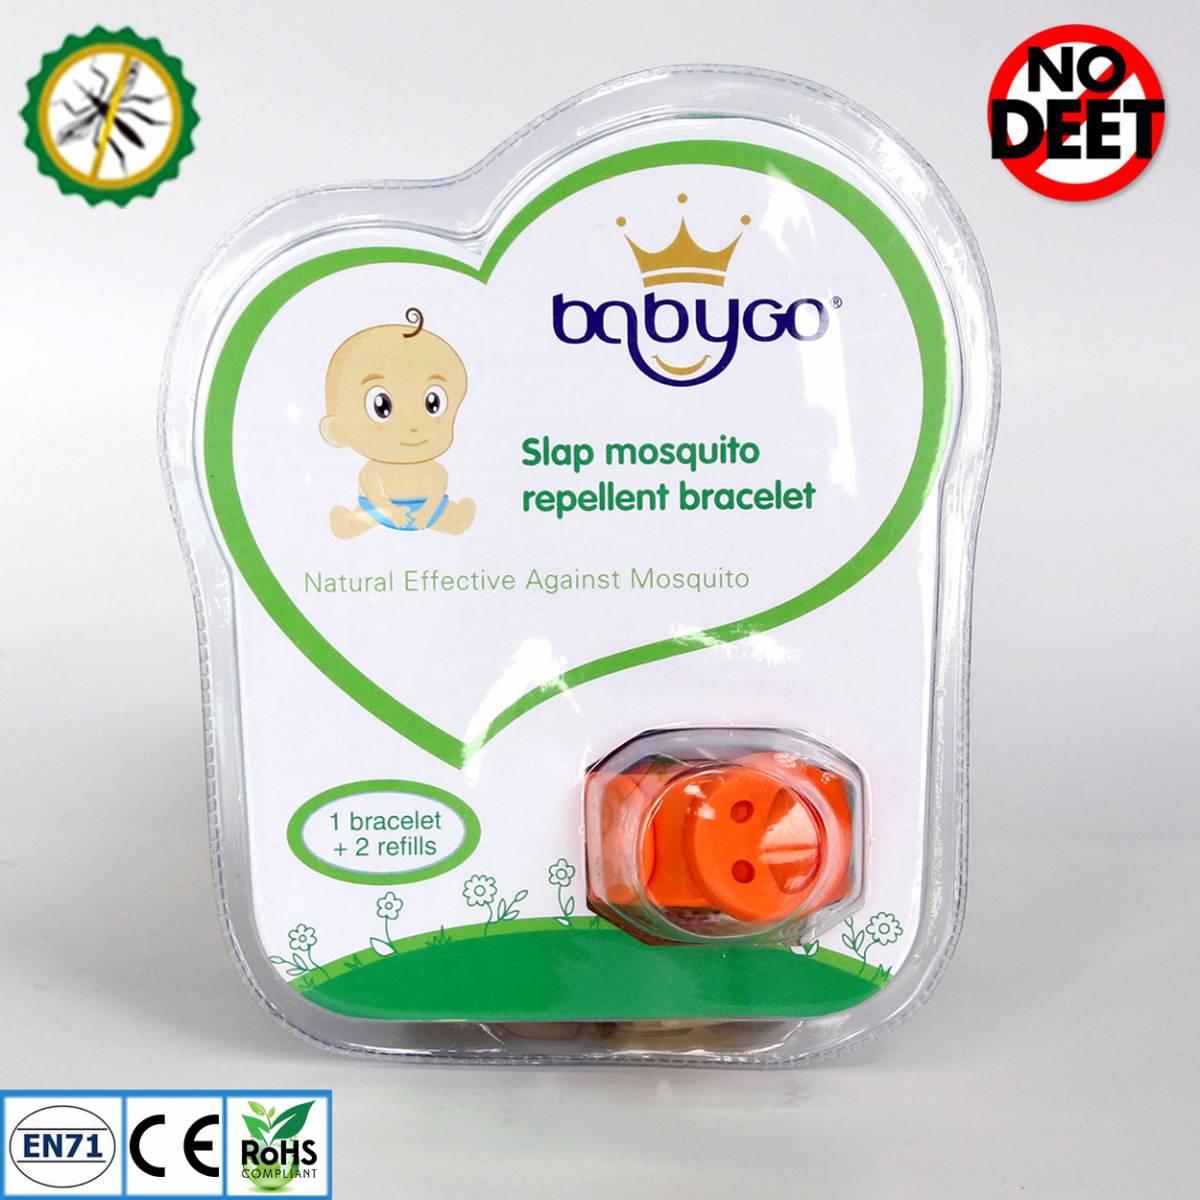 Babygo Slap Mosquito Repellent Bracelet Orange (gelang Anti Nyamuk Anak)1